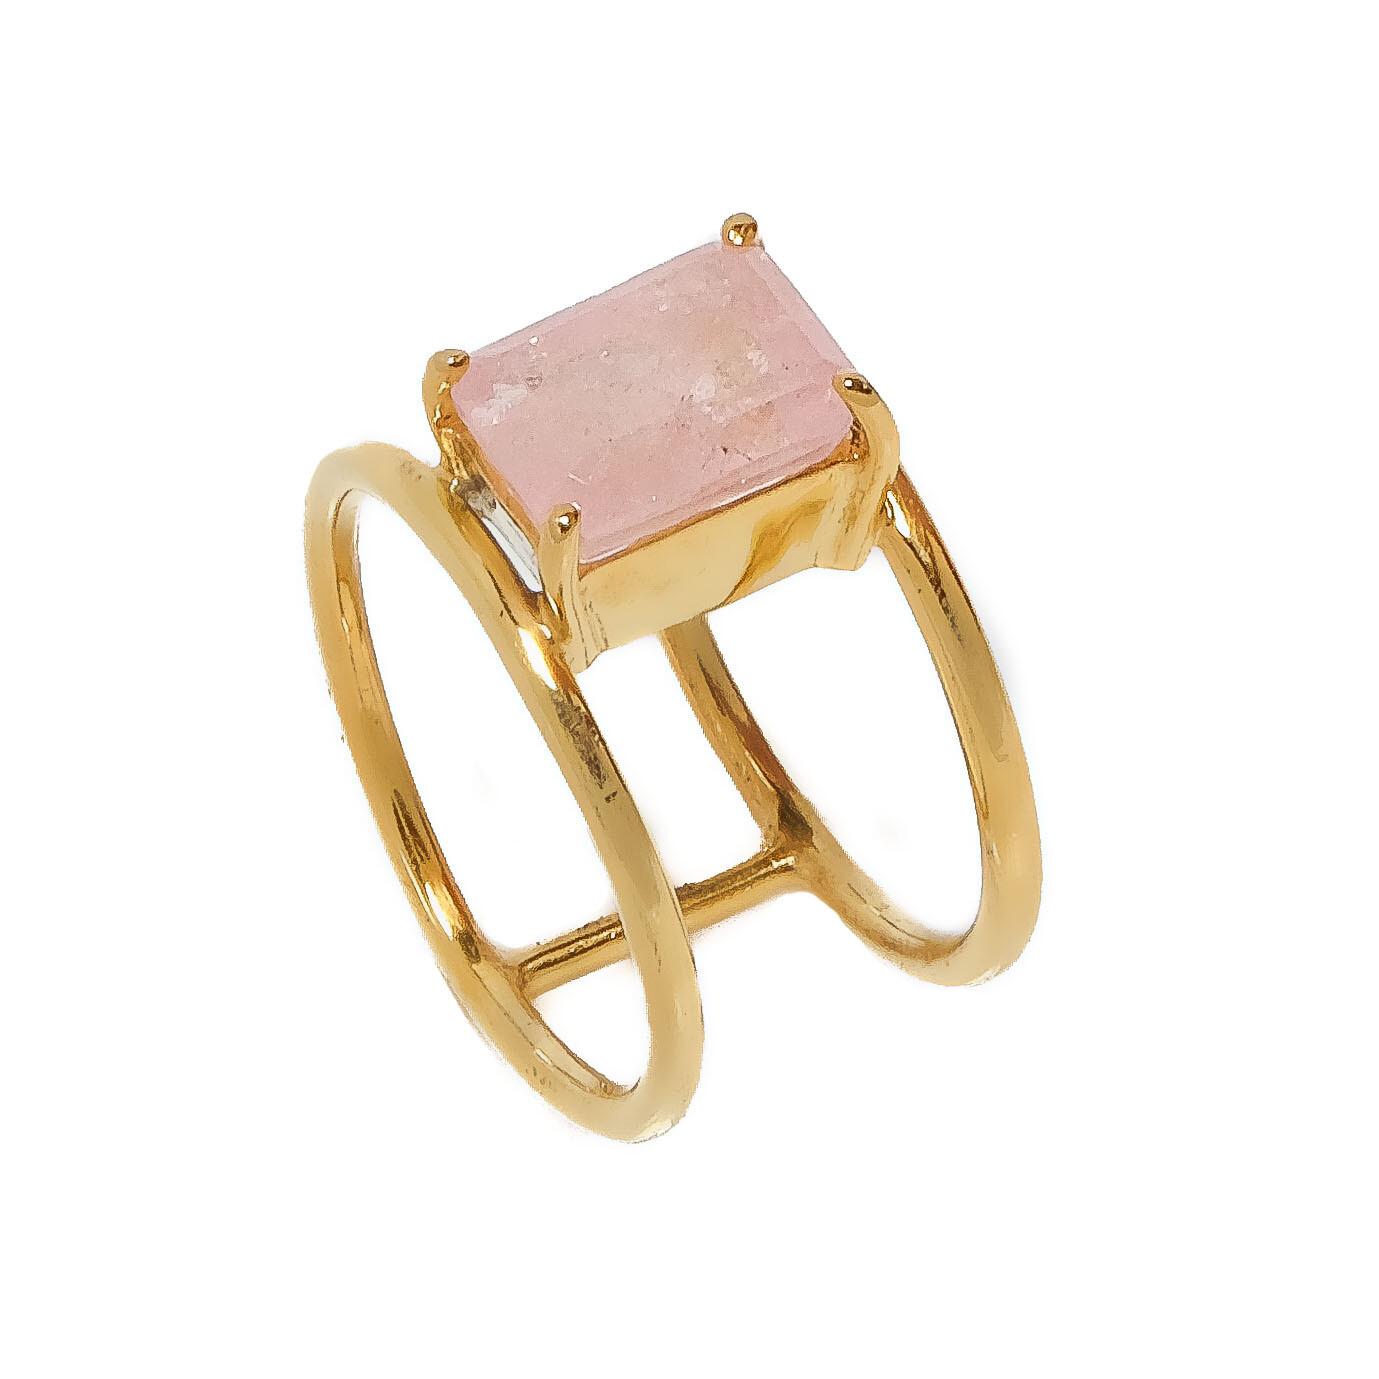 Elemental Double Band Ring - Morganite - 4.5⌀ (Vermeil)